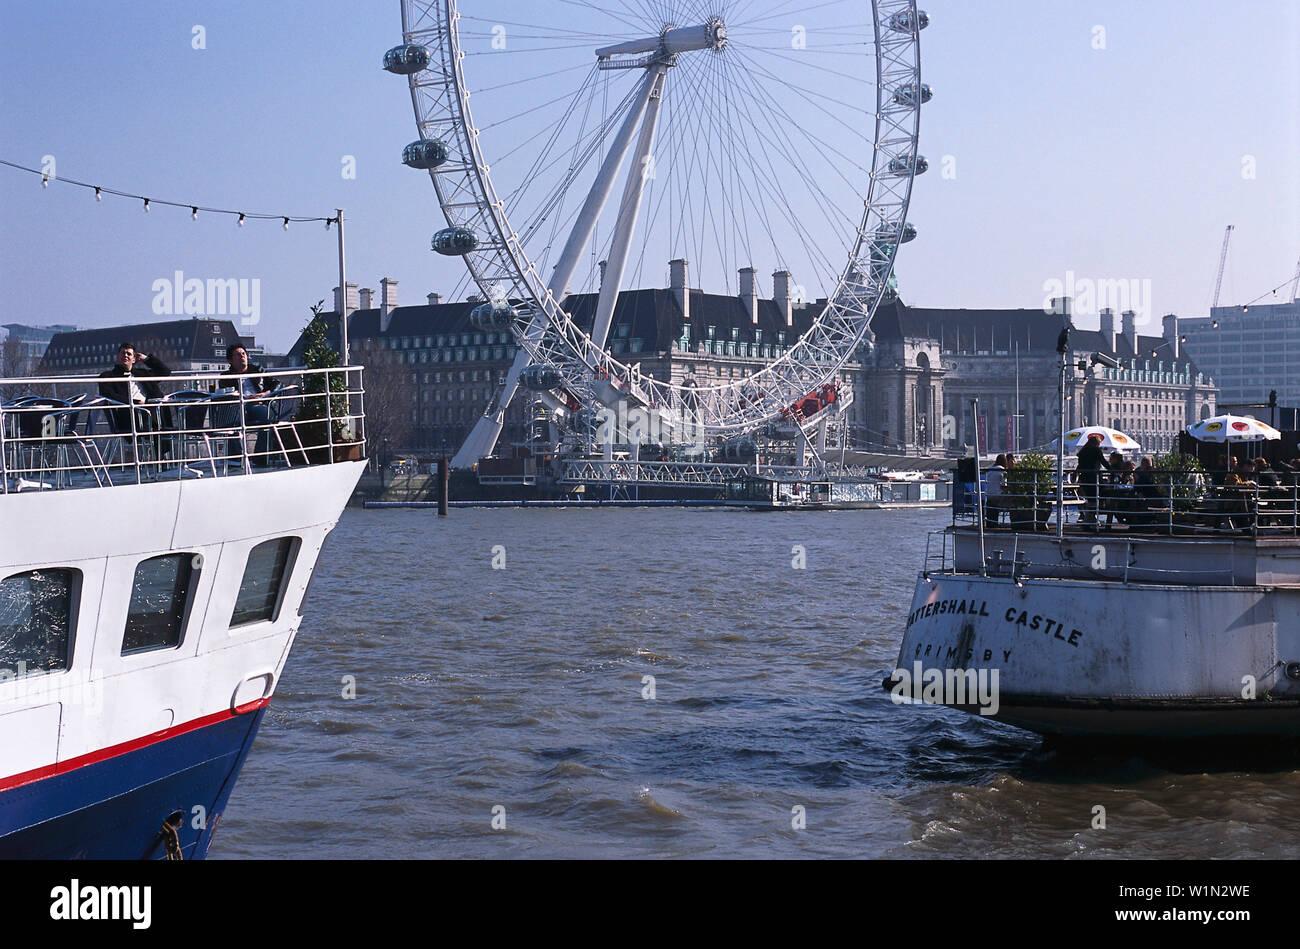 Thames & London Eye, London, England Great Britain - Stock Image